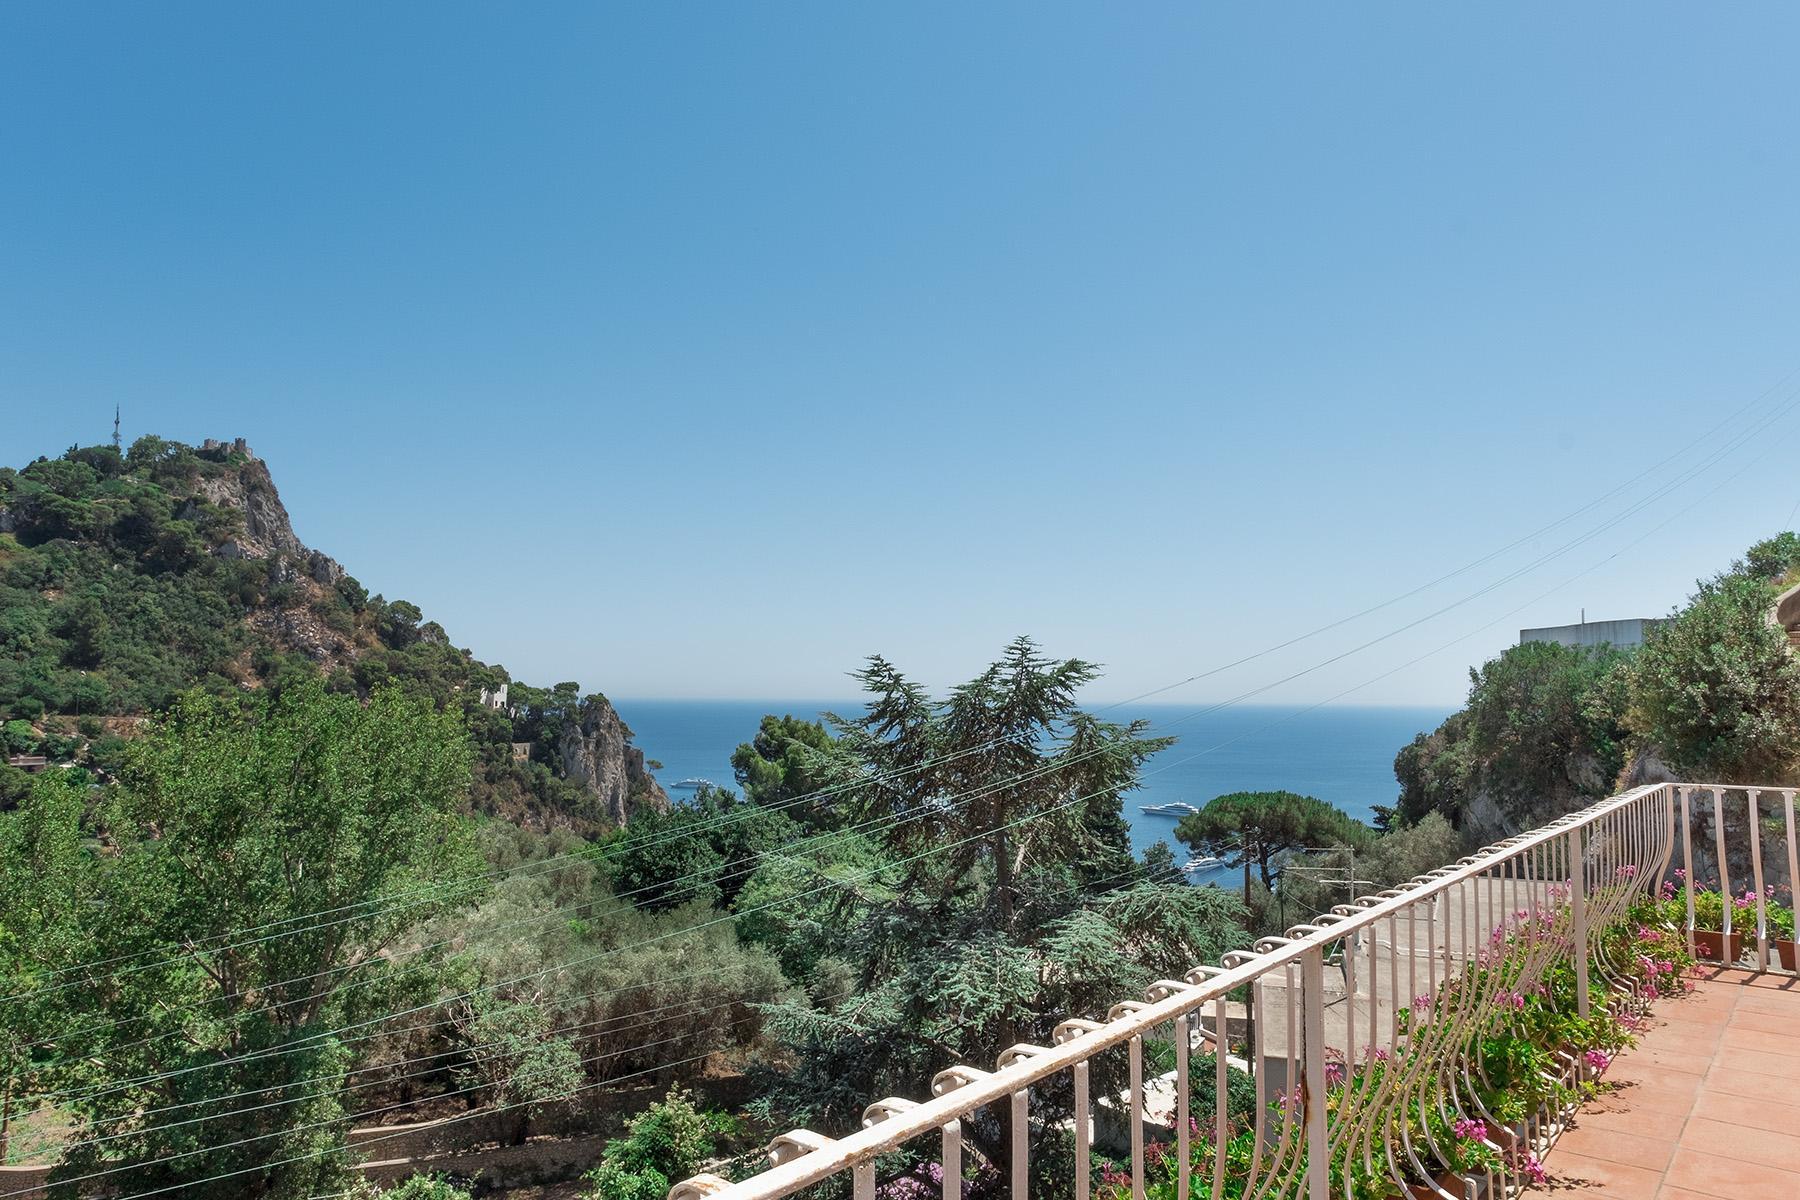 Прекрасная вилла с панорамным видом на море в центре легендарного острова Капри, Италия - 15